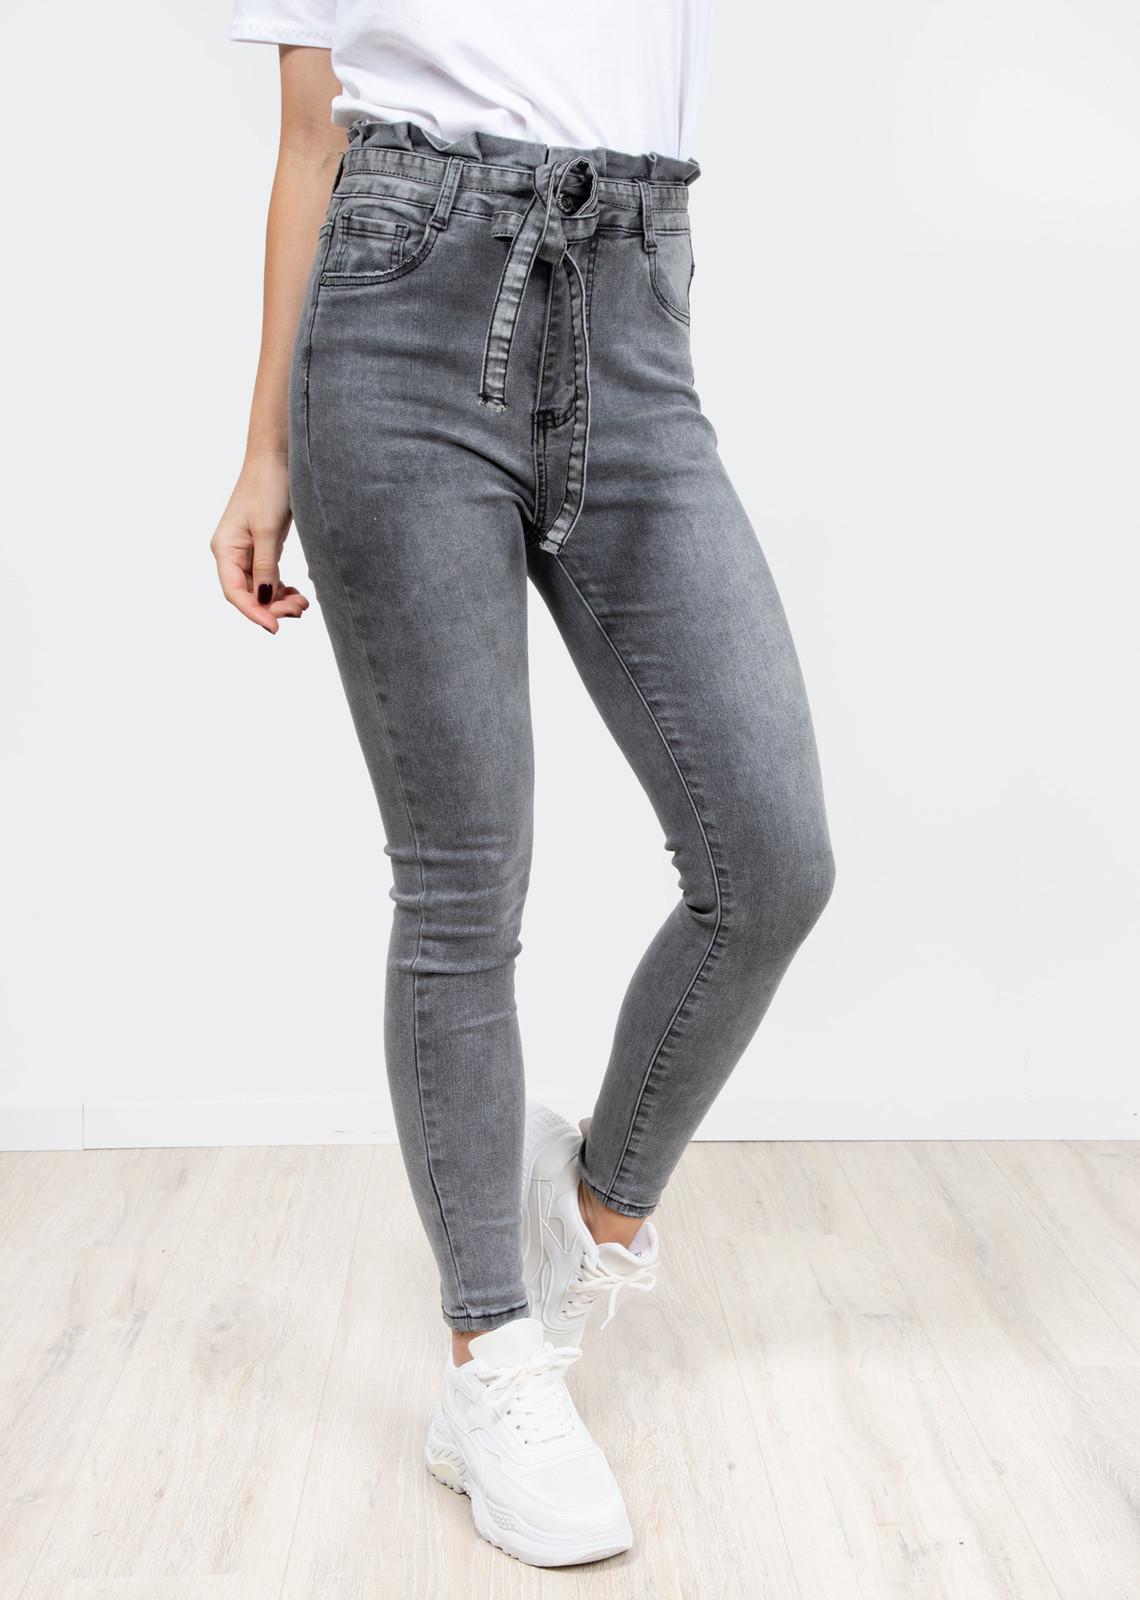 Denim jeans grijs Lina